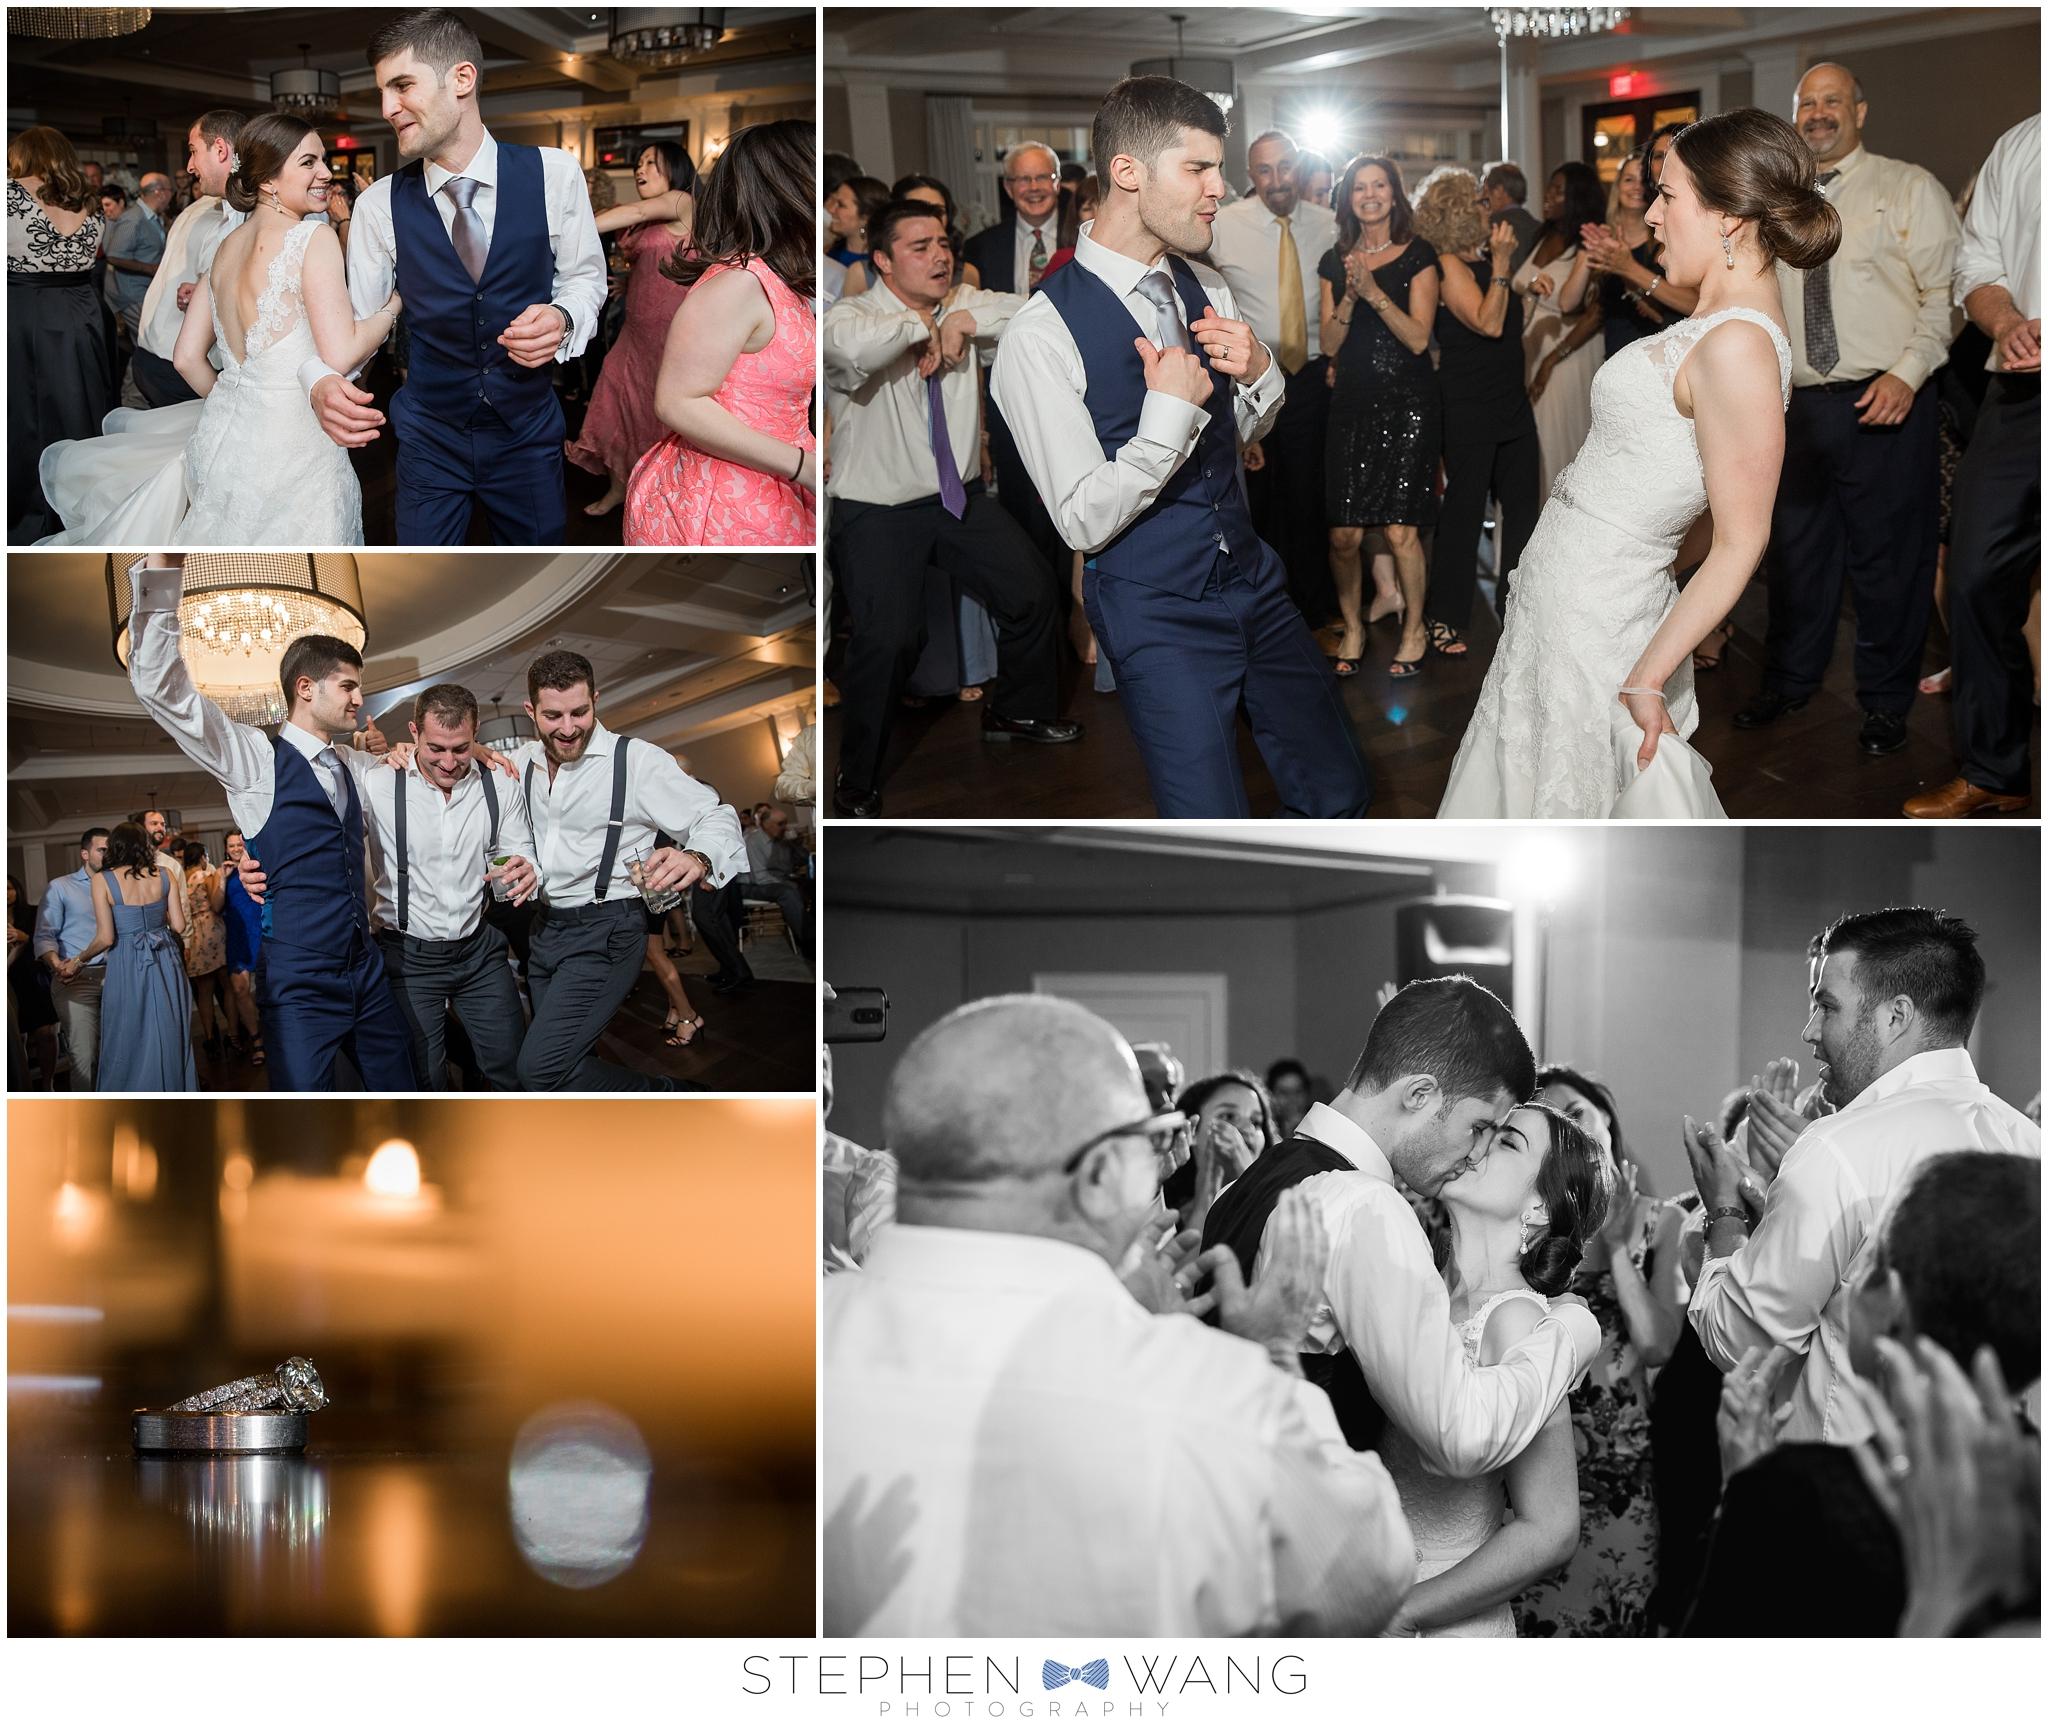 Stephen Wang Photography Shorehaven Norwalk CT Wedding Photographer connecticut shoreline shore haven - 40.jpg